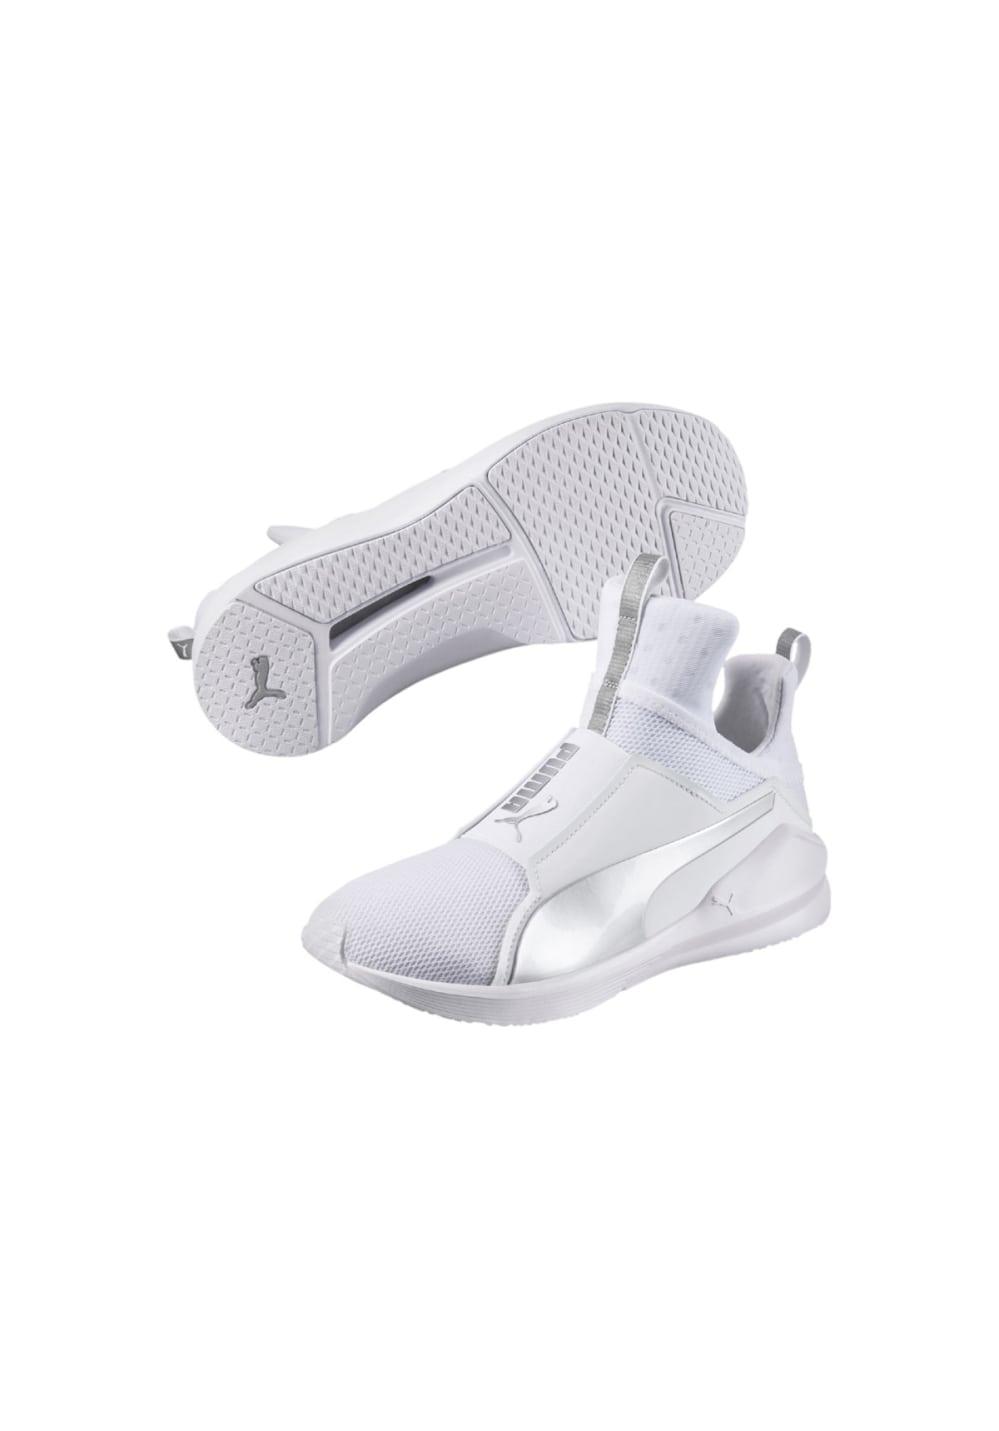 14139e65e59 ... Puma Fierce Core - Chaussures fitness pour Femme - Blanc. Retour vers  l aperçu. -60%